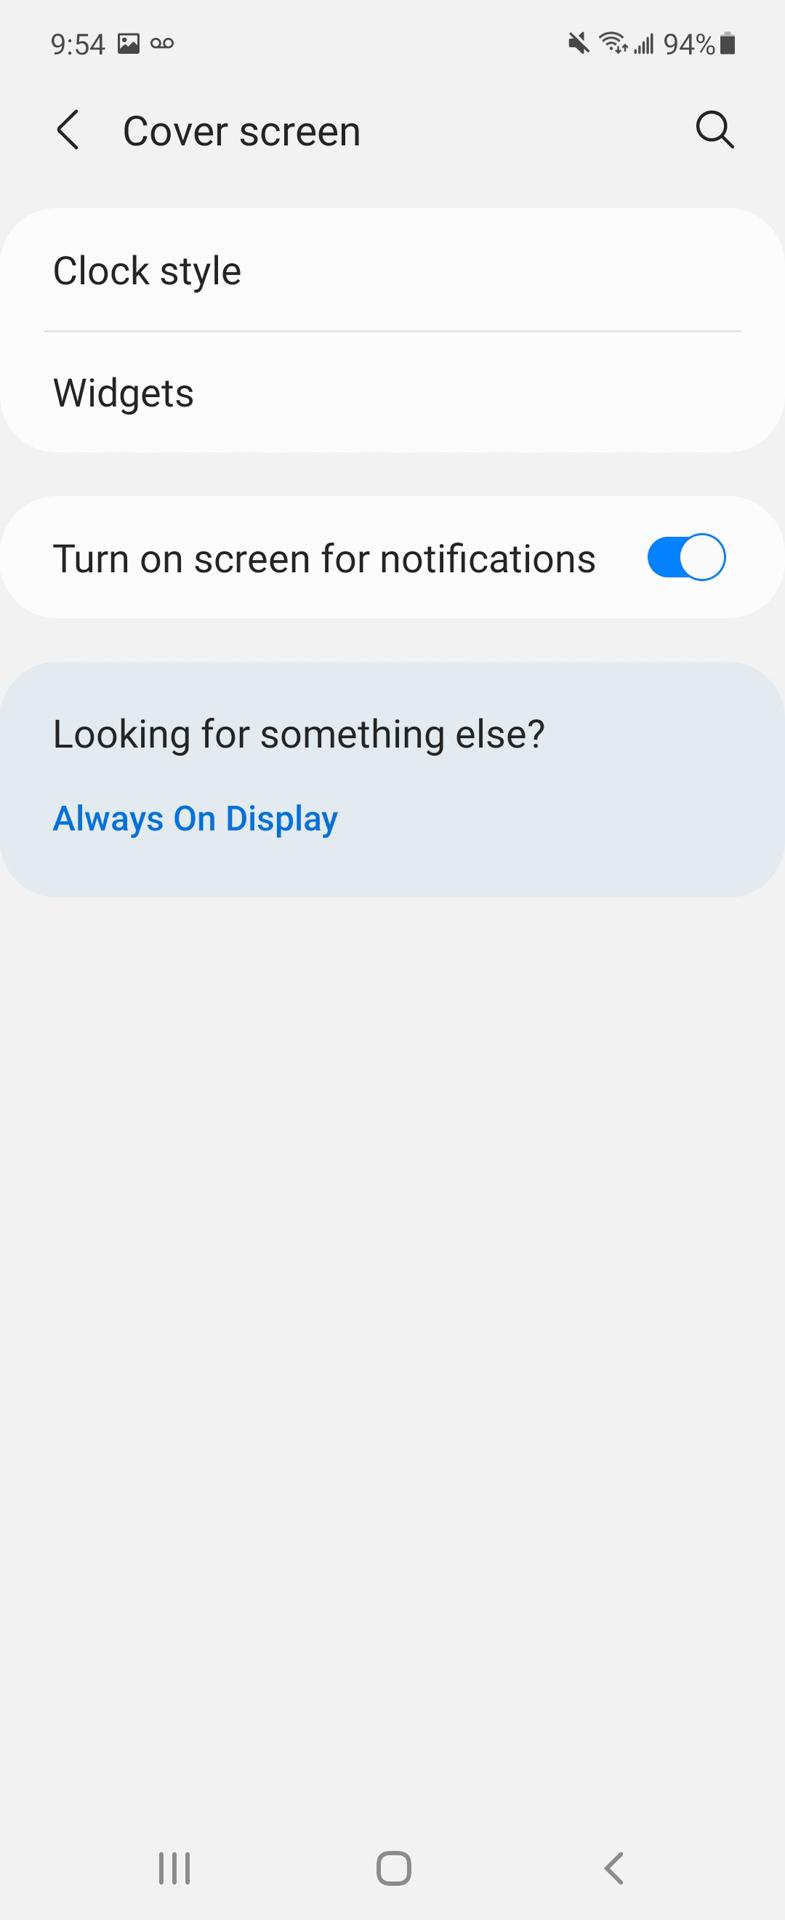 Samsung Galaxy Z Flip 3 Cover Screen controls